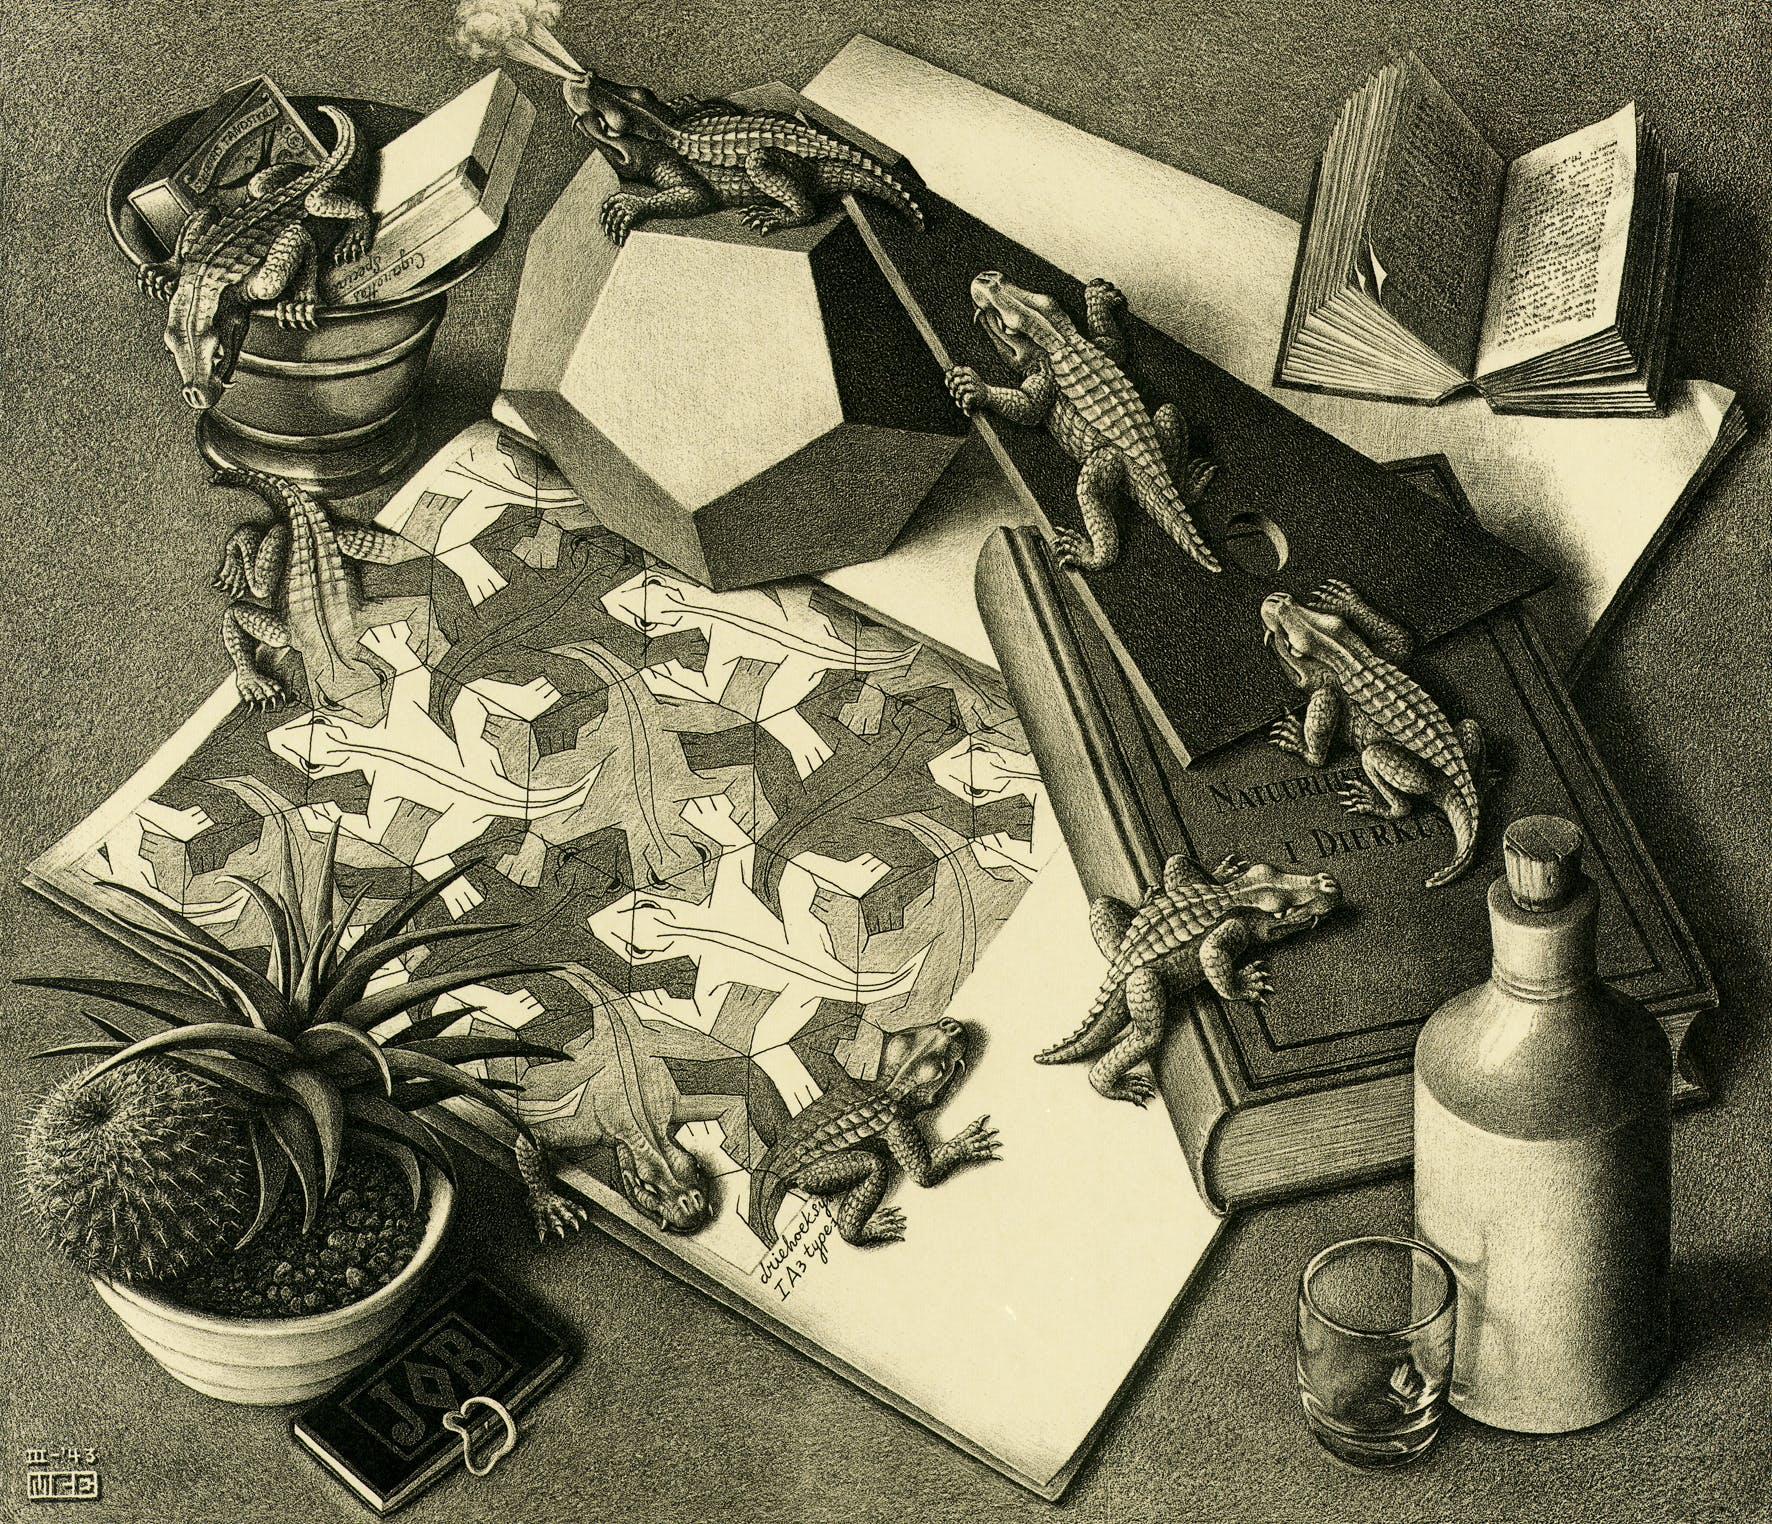 1943, Maurits Cornelis Escher